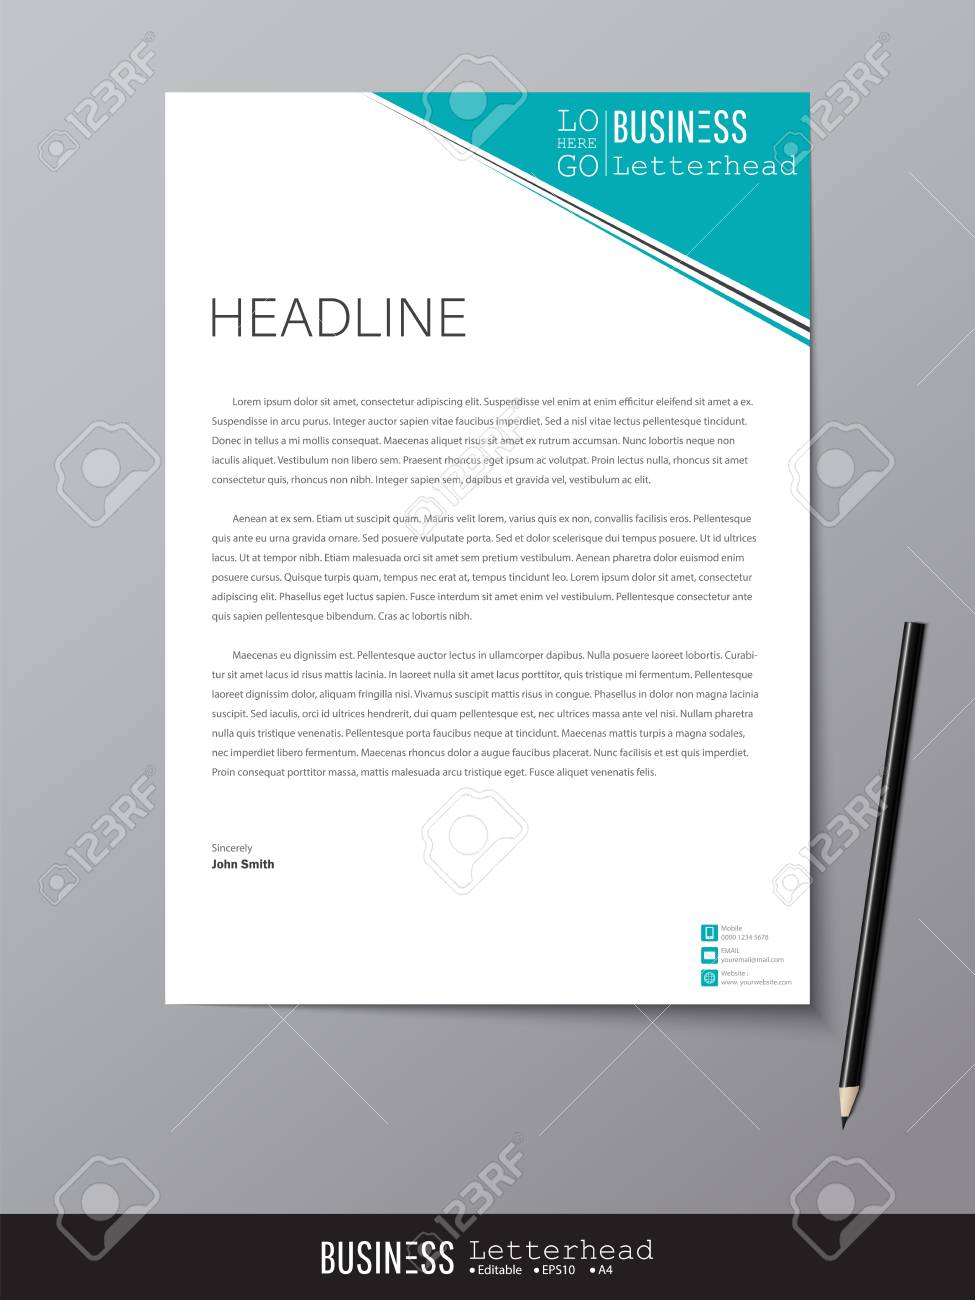 Letterhead design template and mockup minimalist style vector letterhead design template and mockup minimalist style vector design for business or letter layout spiritdancerdesigns Images